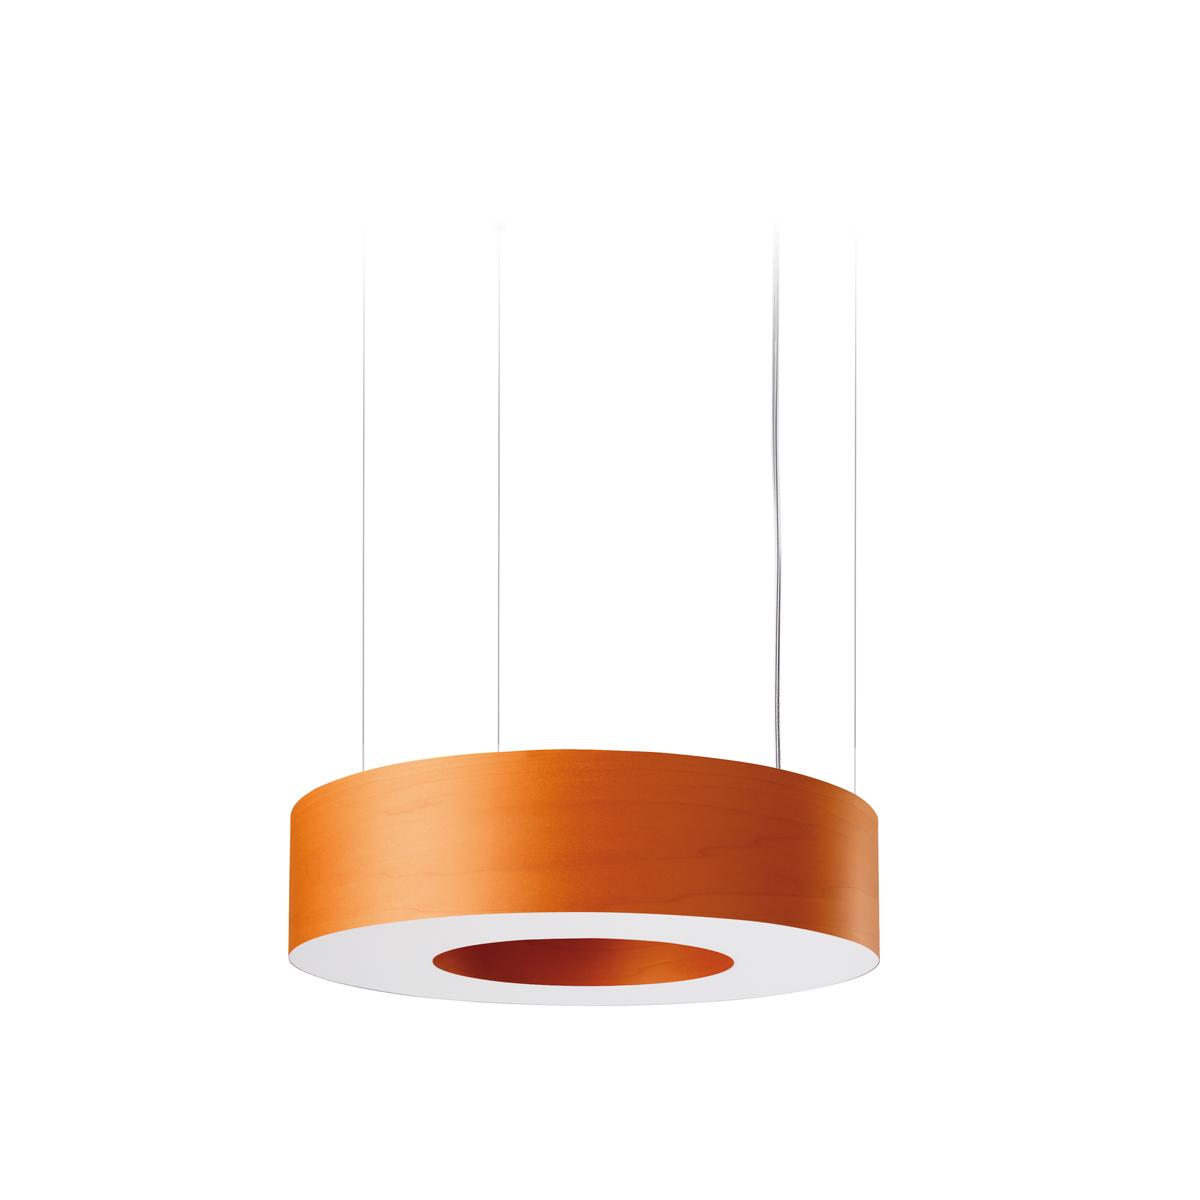 LZF Lamps Saturnia Small LED Pendelleuchte SAT SP LED DIM0-10V 25